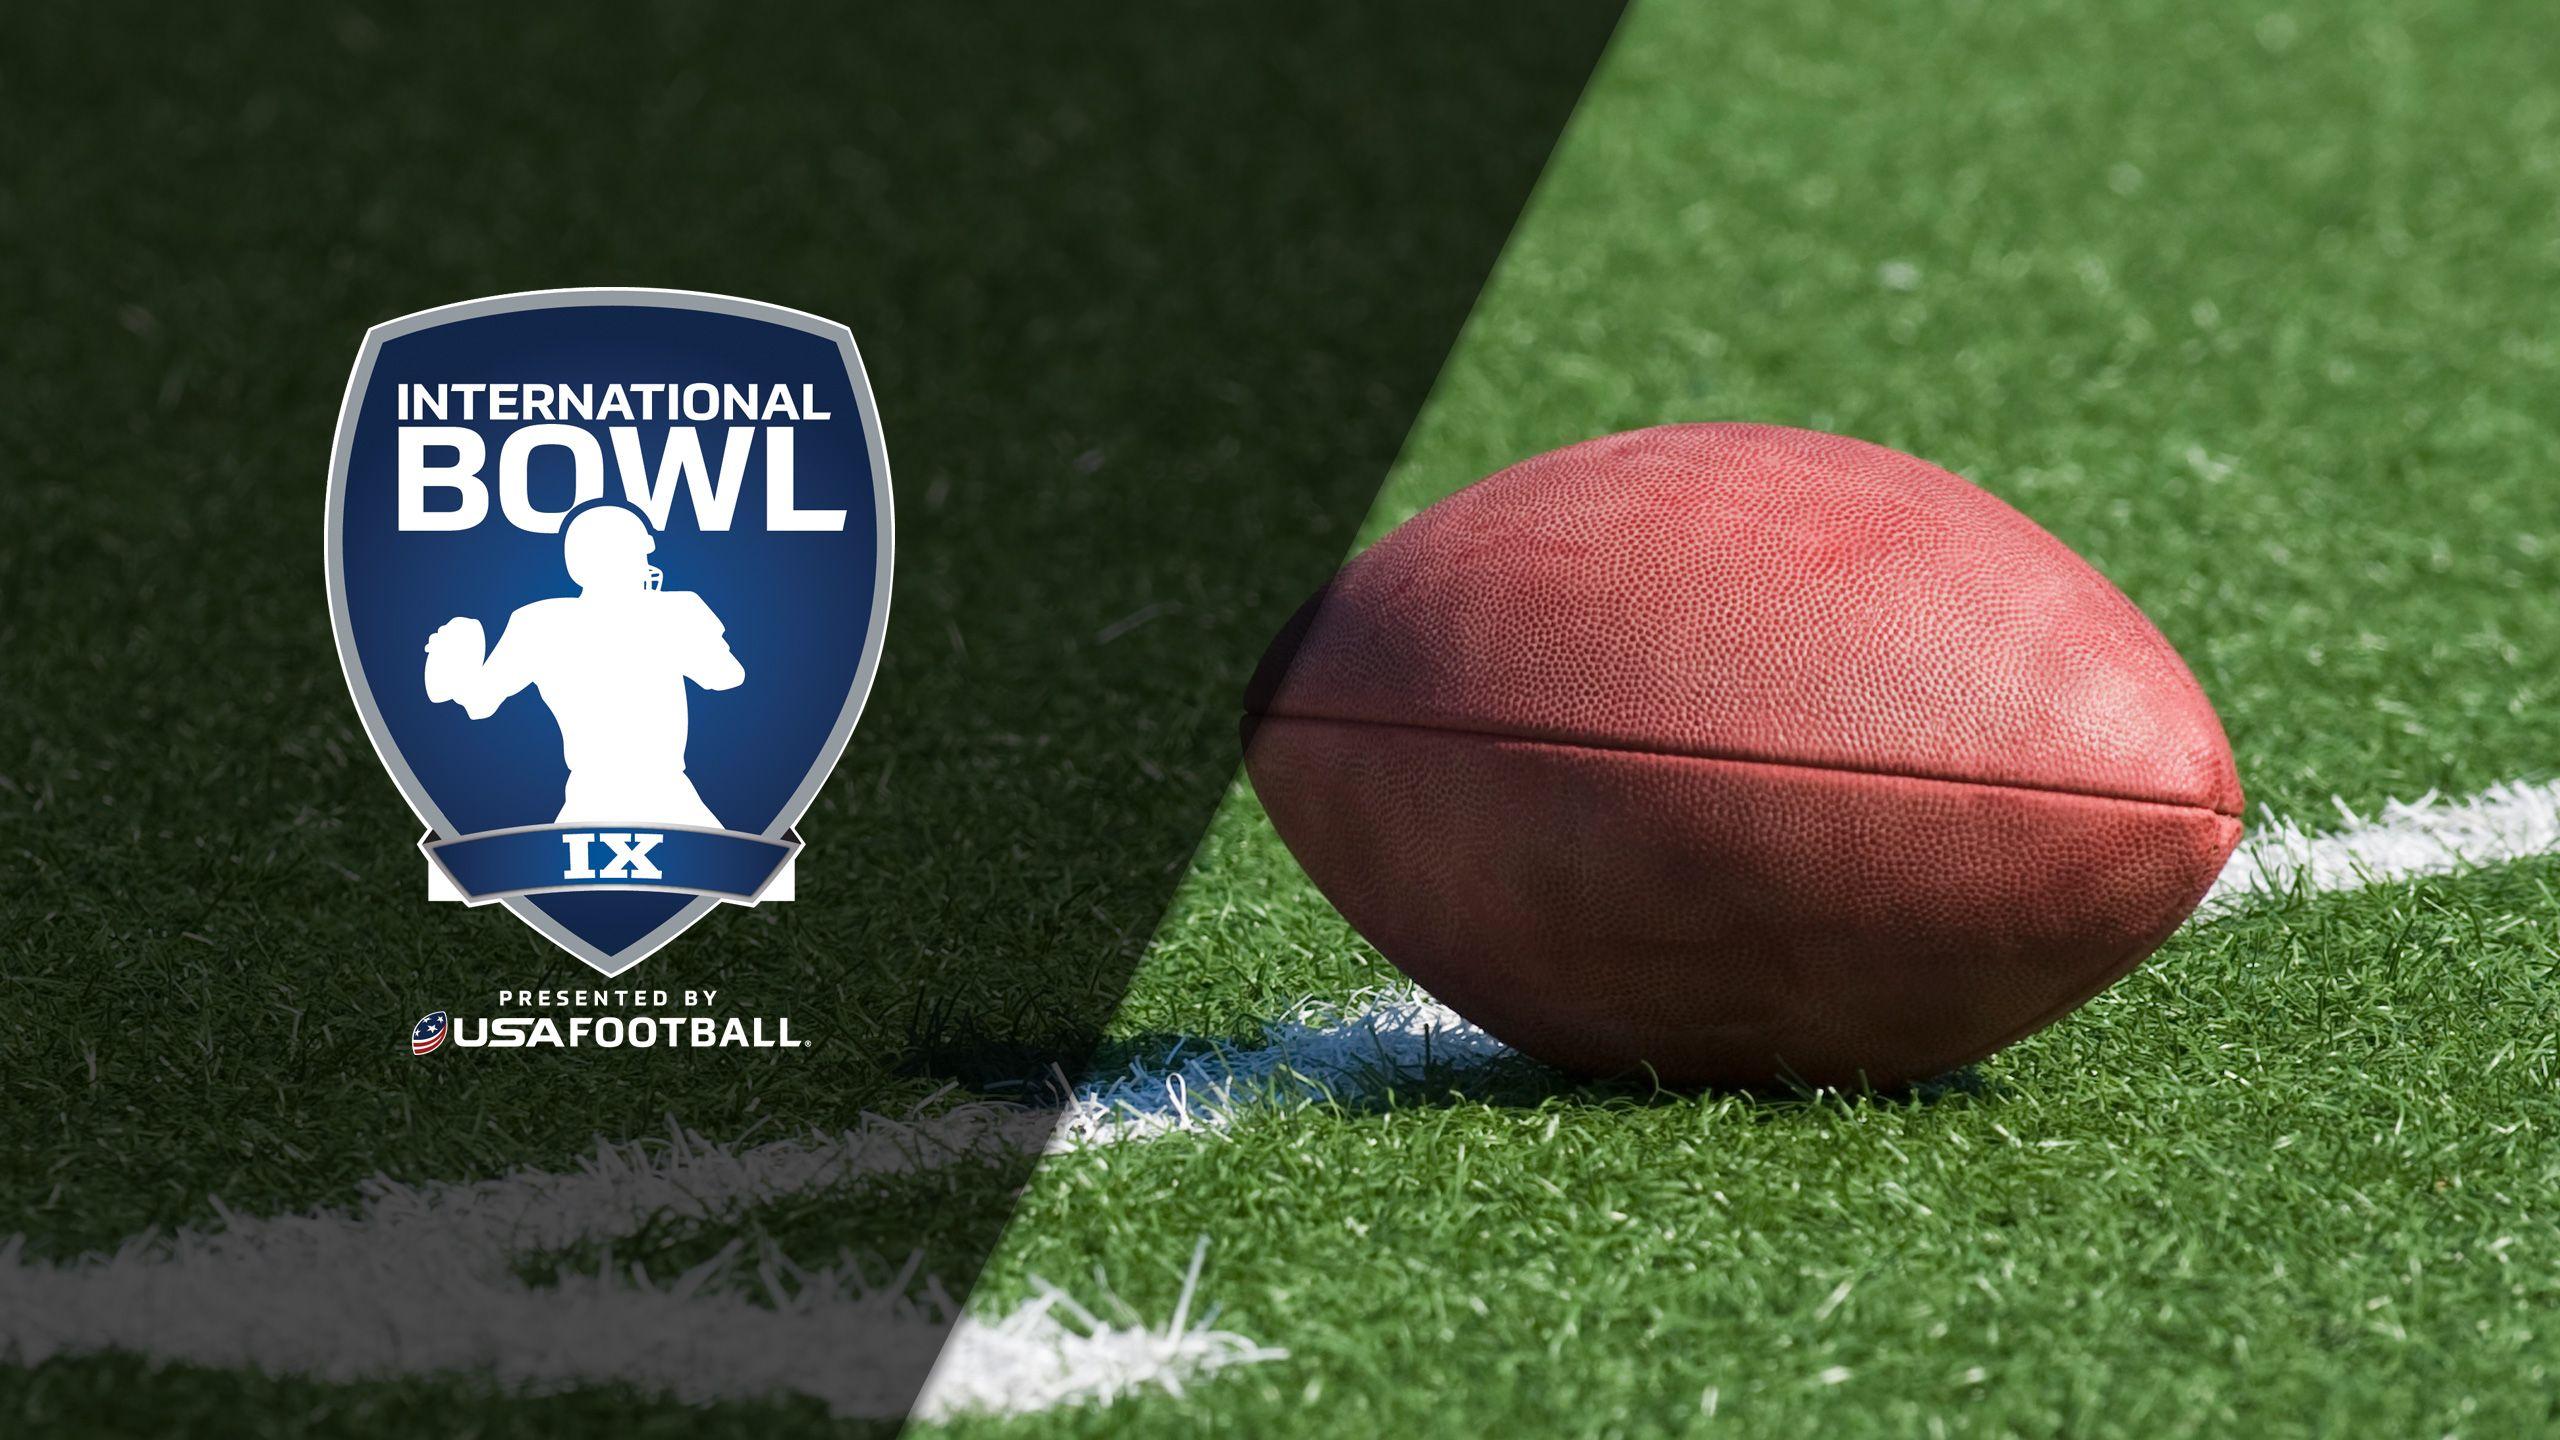 U.S. Under-16 National Team vs. U-16 UANL (Mexico) (International Bowl)